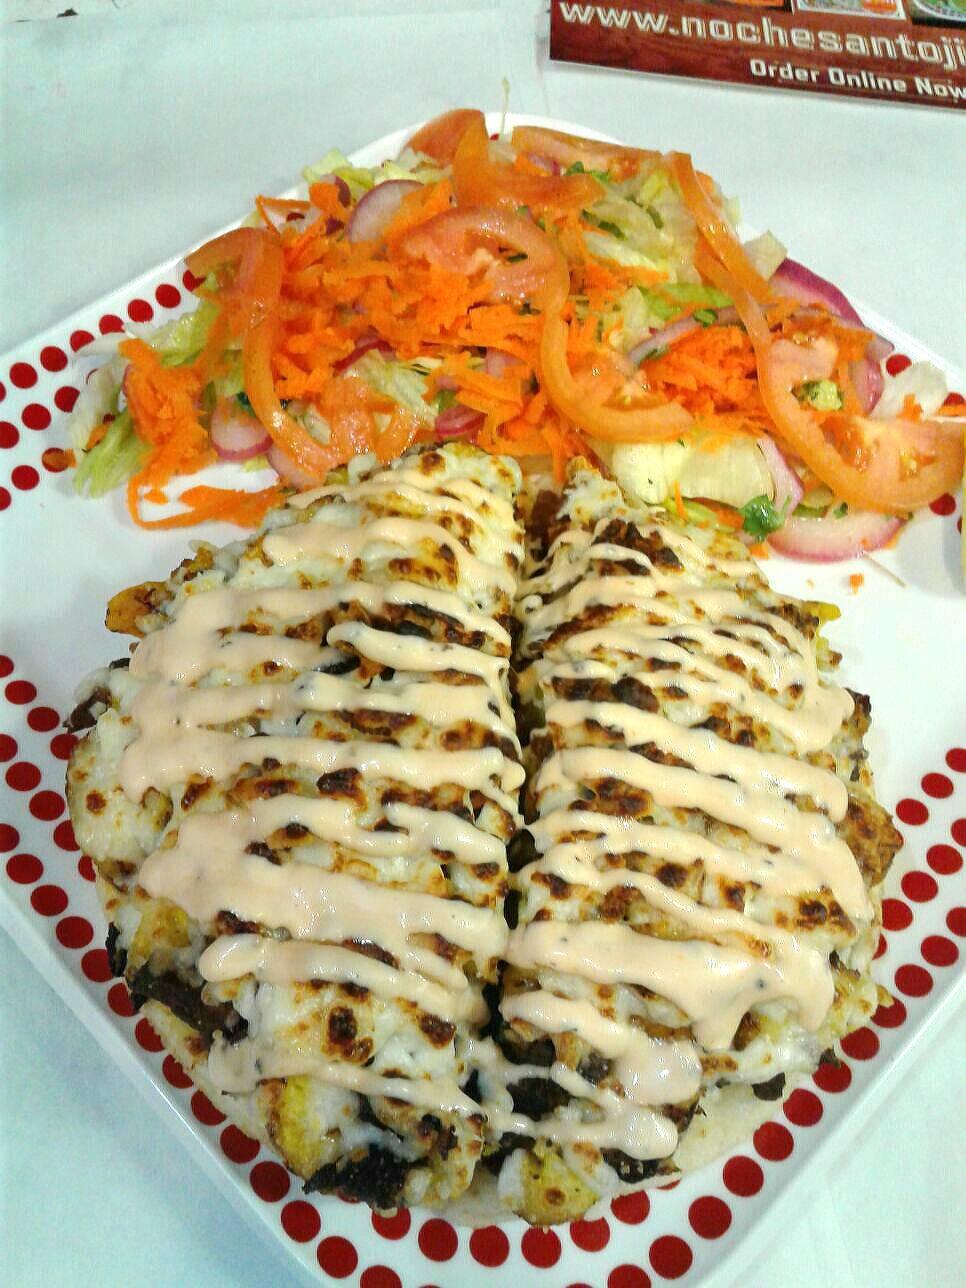 Noches Antojitos | restaurant | 7523 Bergenline Ave, North Bergen, NJ 07047, USA | 2012958594 OR +1 201-295-8594